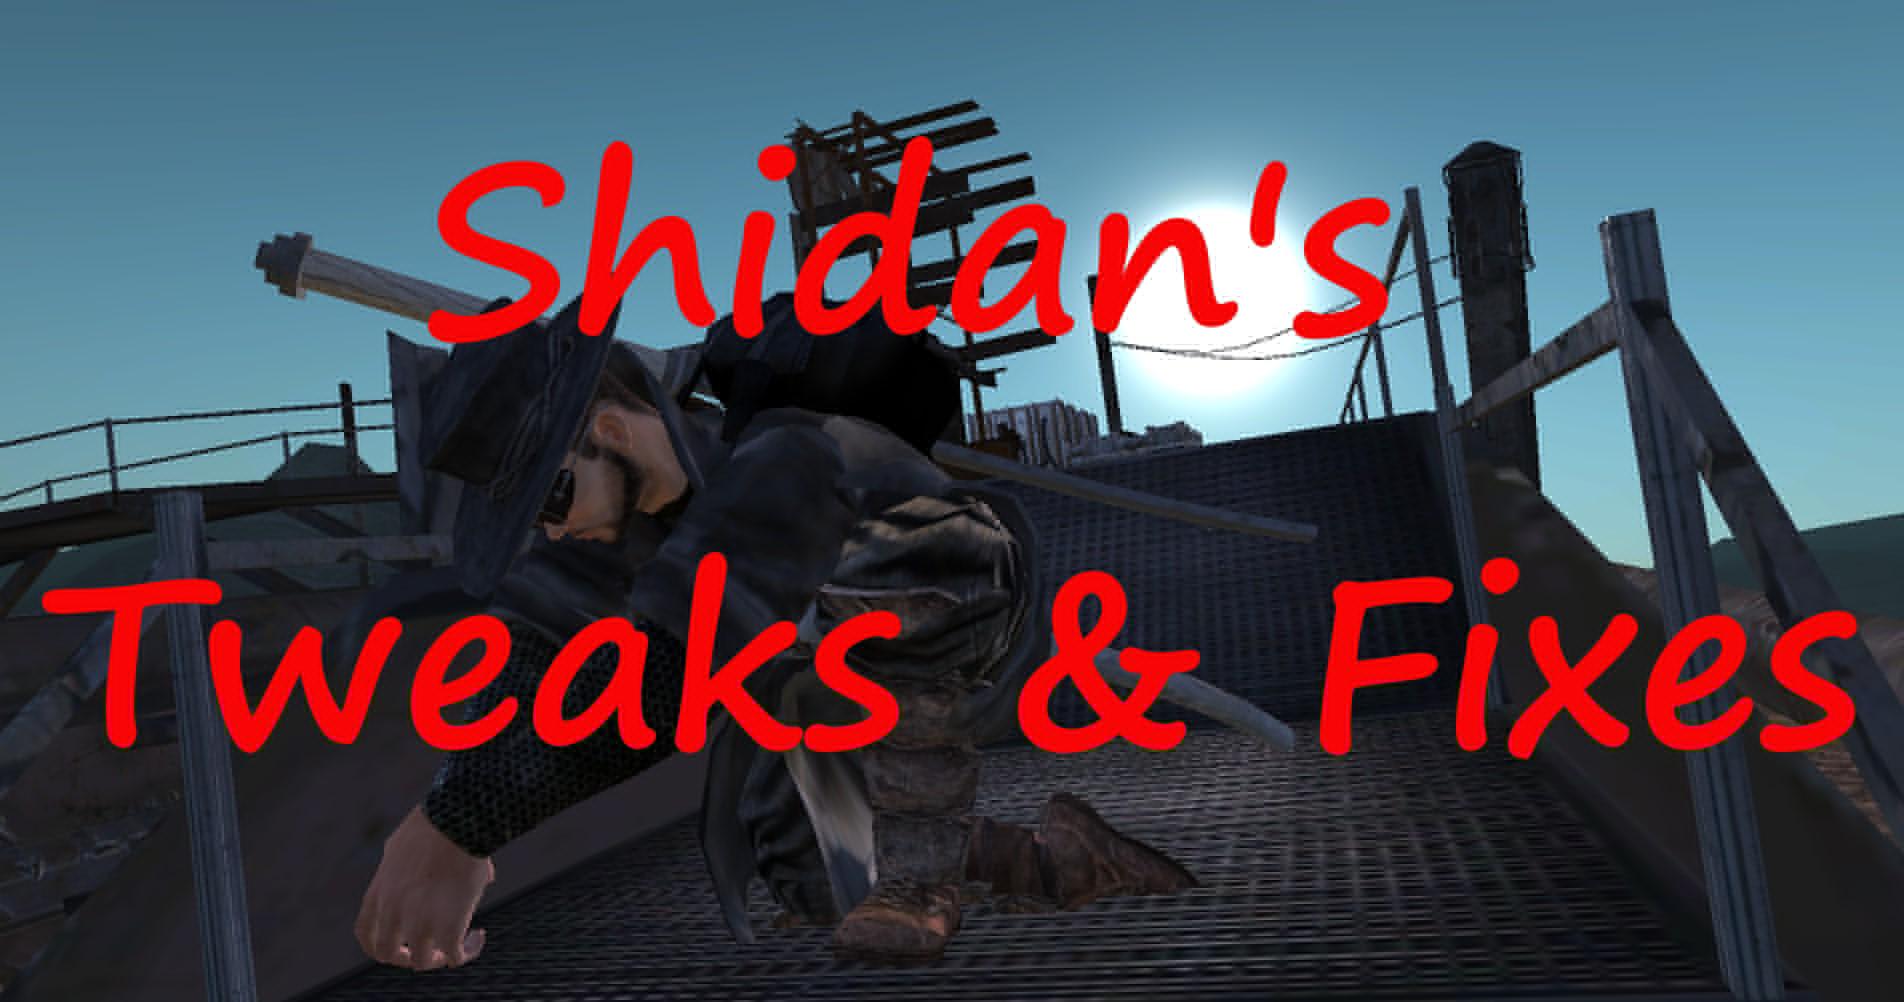 Shidan's Tweaks & Fixes / Исправления от Шидана